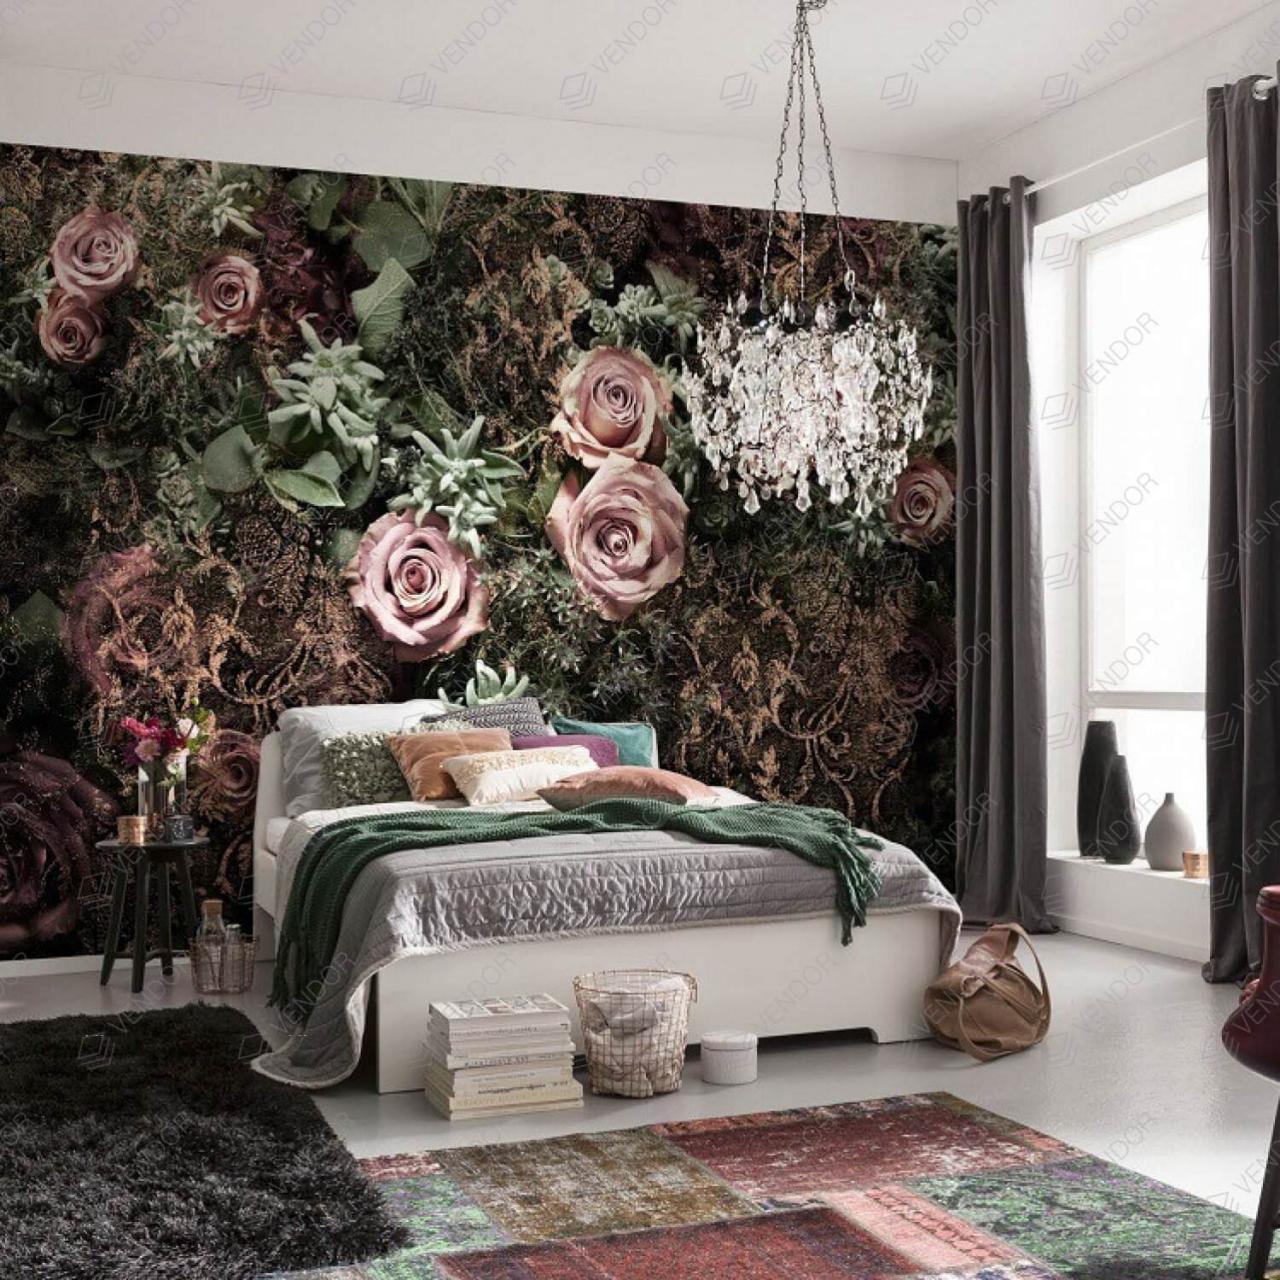 صورة ورق جدران غرف نوم , جملي غرفة نومك باجمد ورق حائط 🤫 6392 2